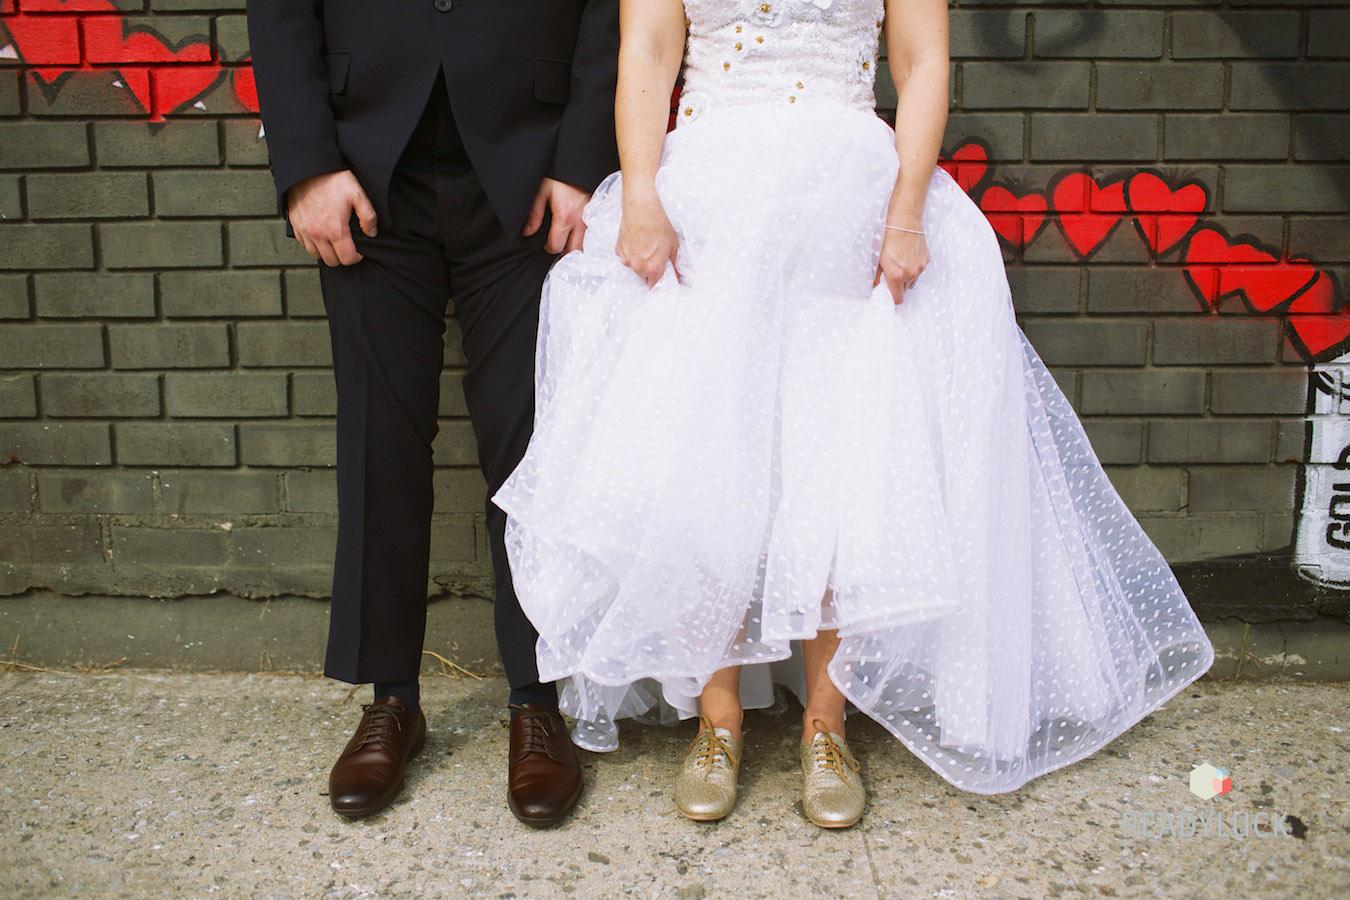 bowling-shoes-gold-wedding-bride-groom